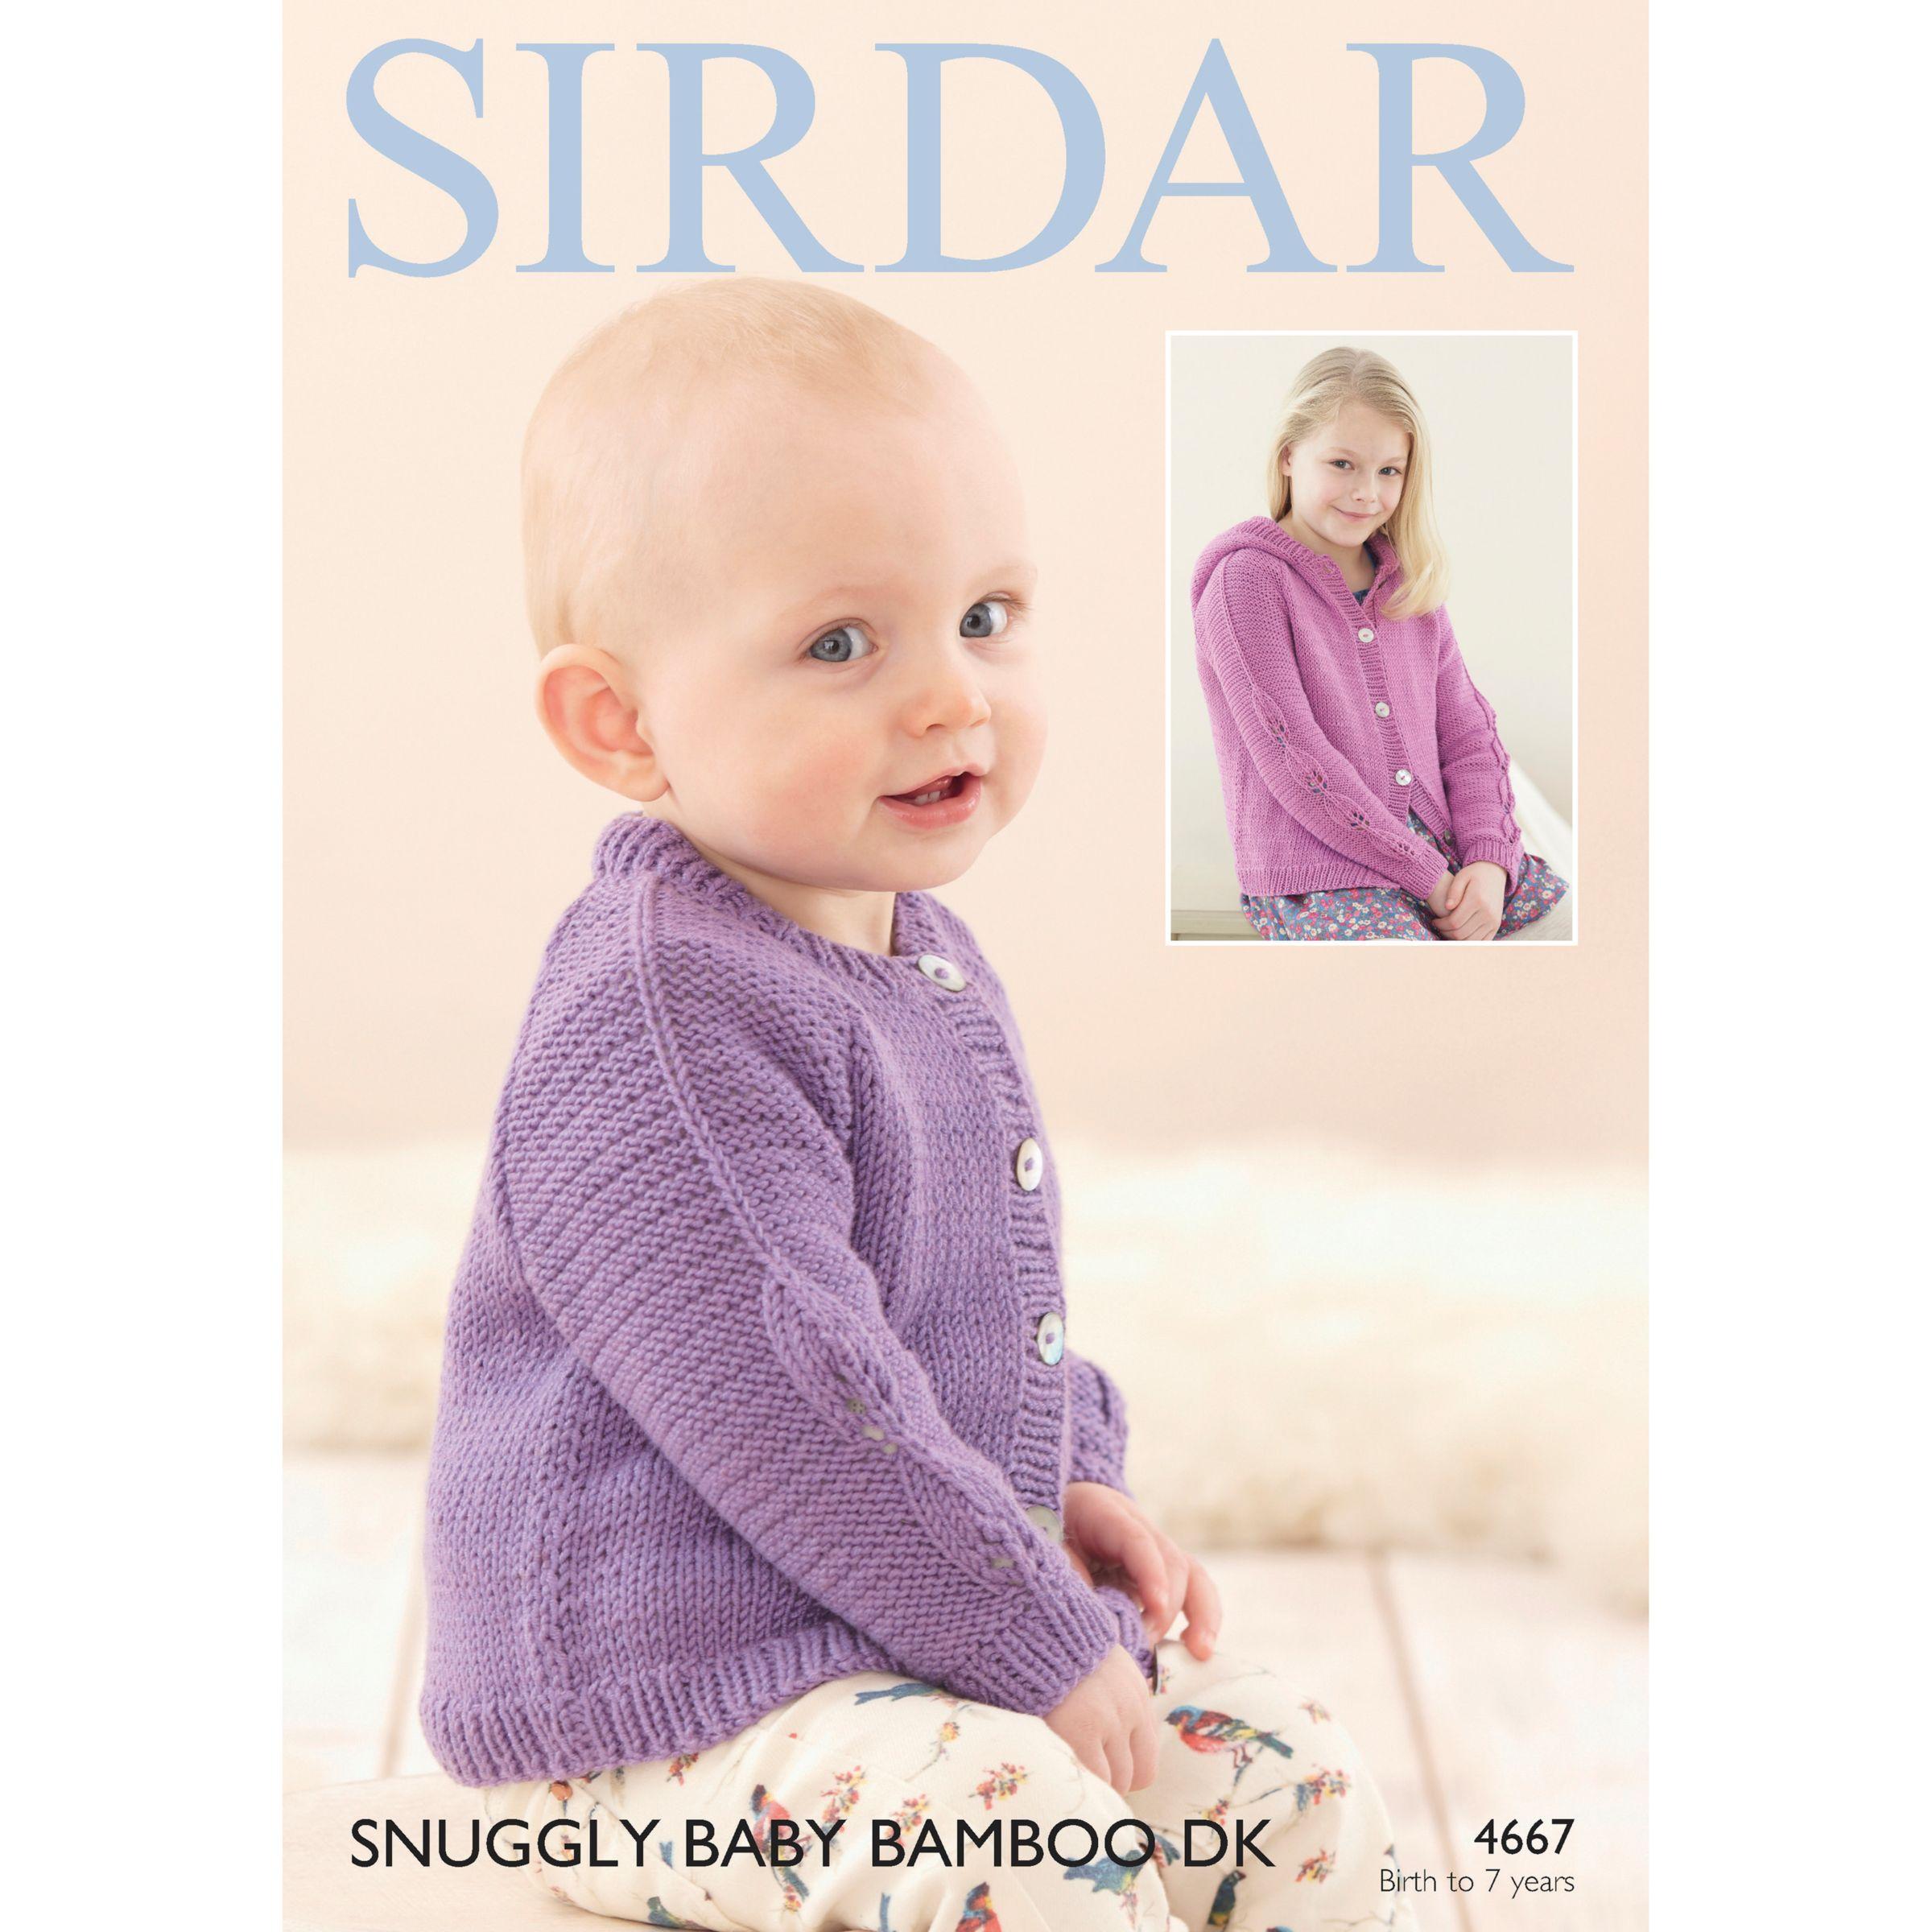 Buy Sirdar Snuggly Baby Bamboo DK Cardigan Knitting Paper Pattern, 4667 Joh...